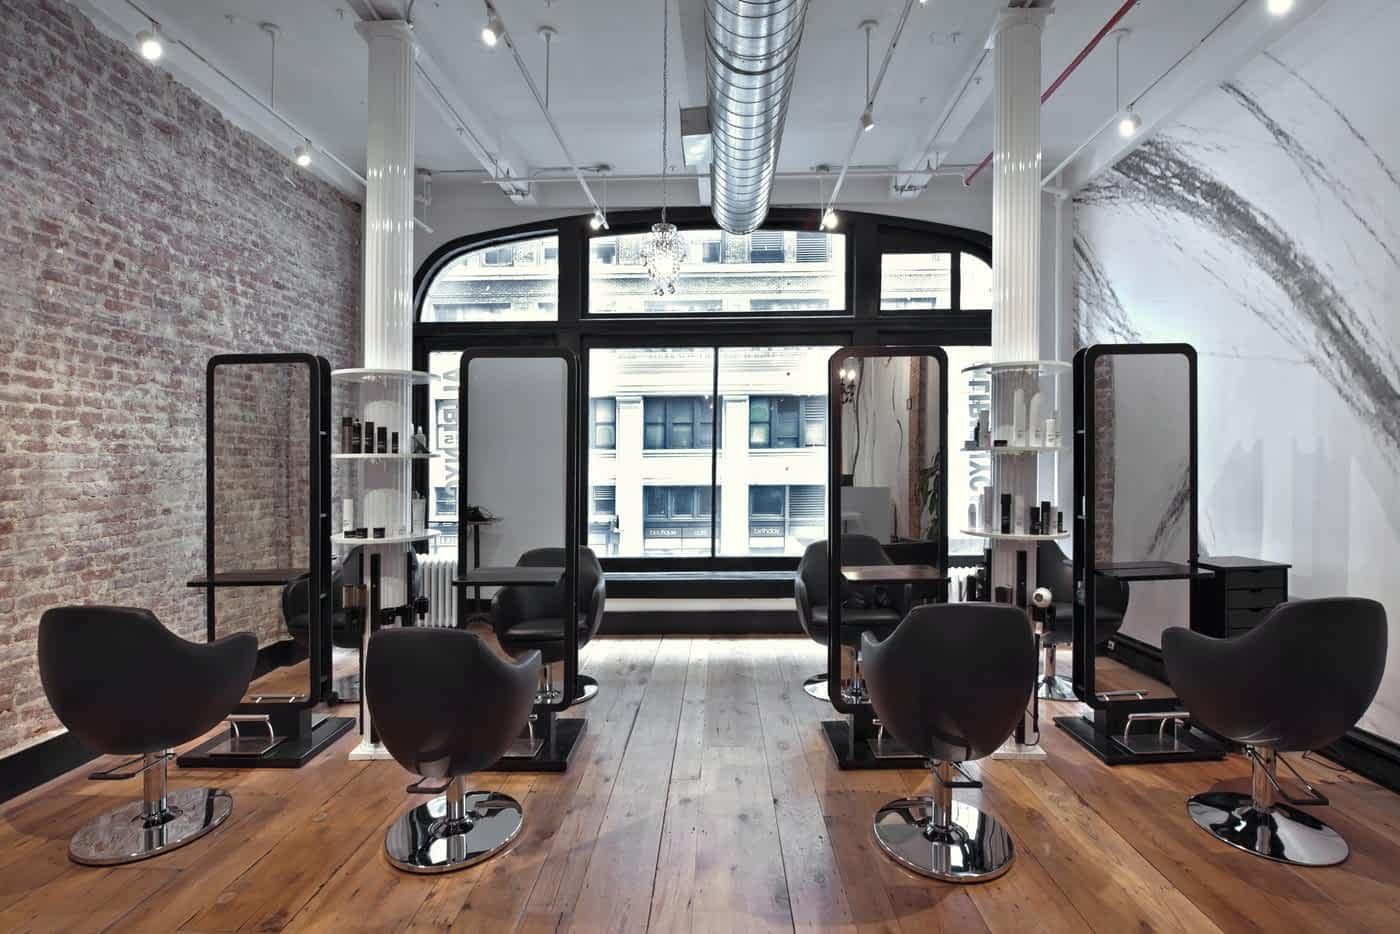 styling stations salon mirrors